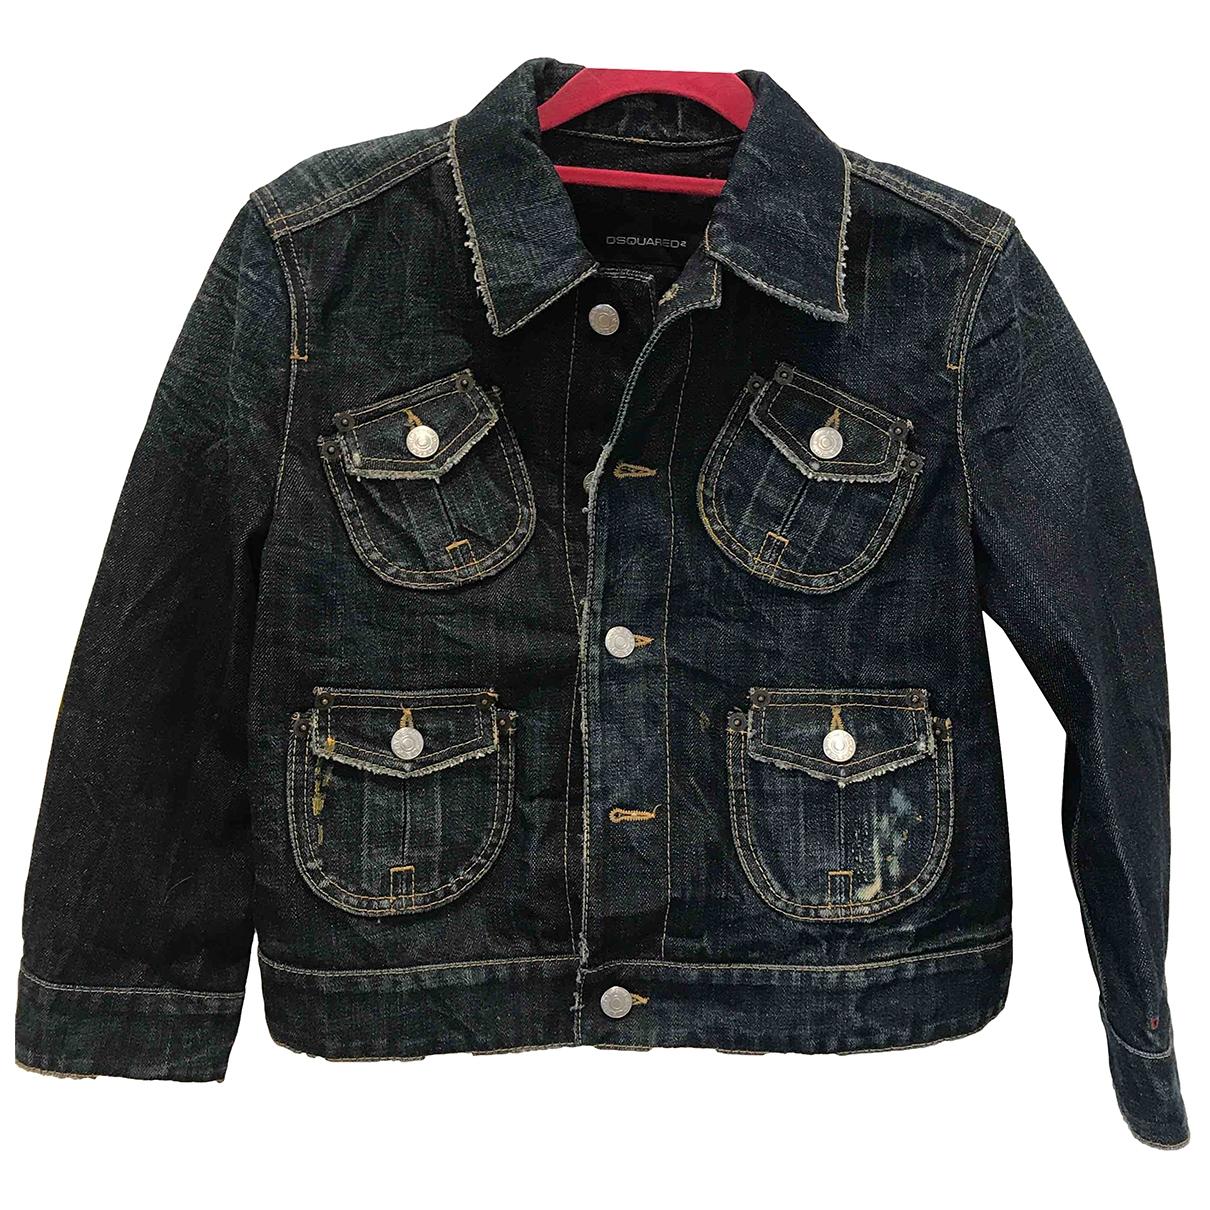 Dsquared2 \N Blue Denim - Jeans jacket for Women 42 IT